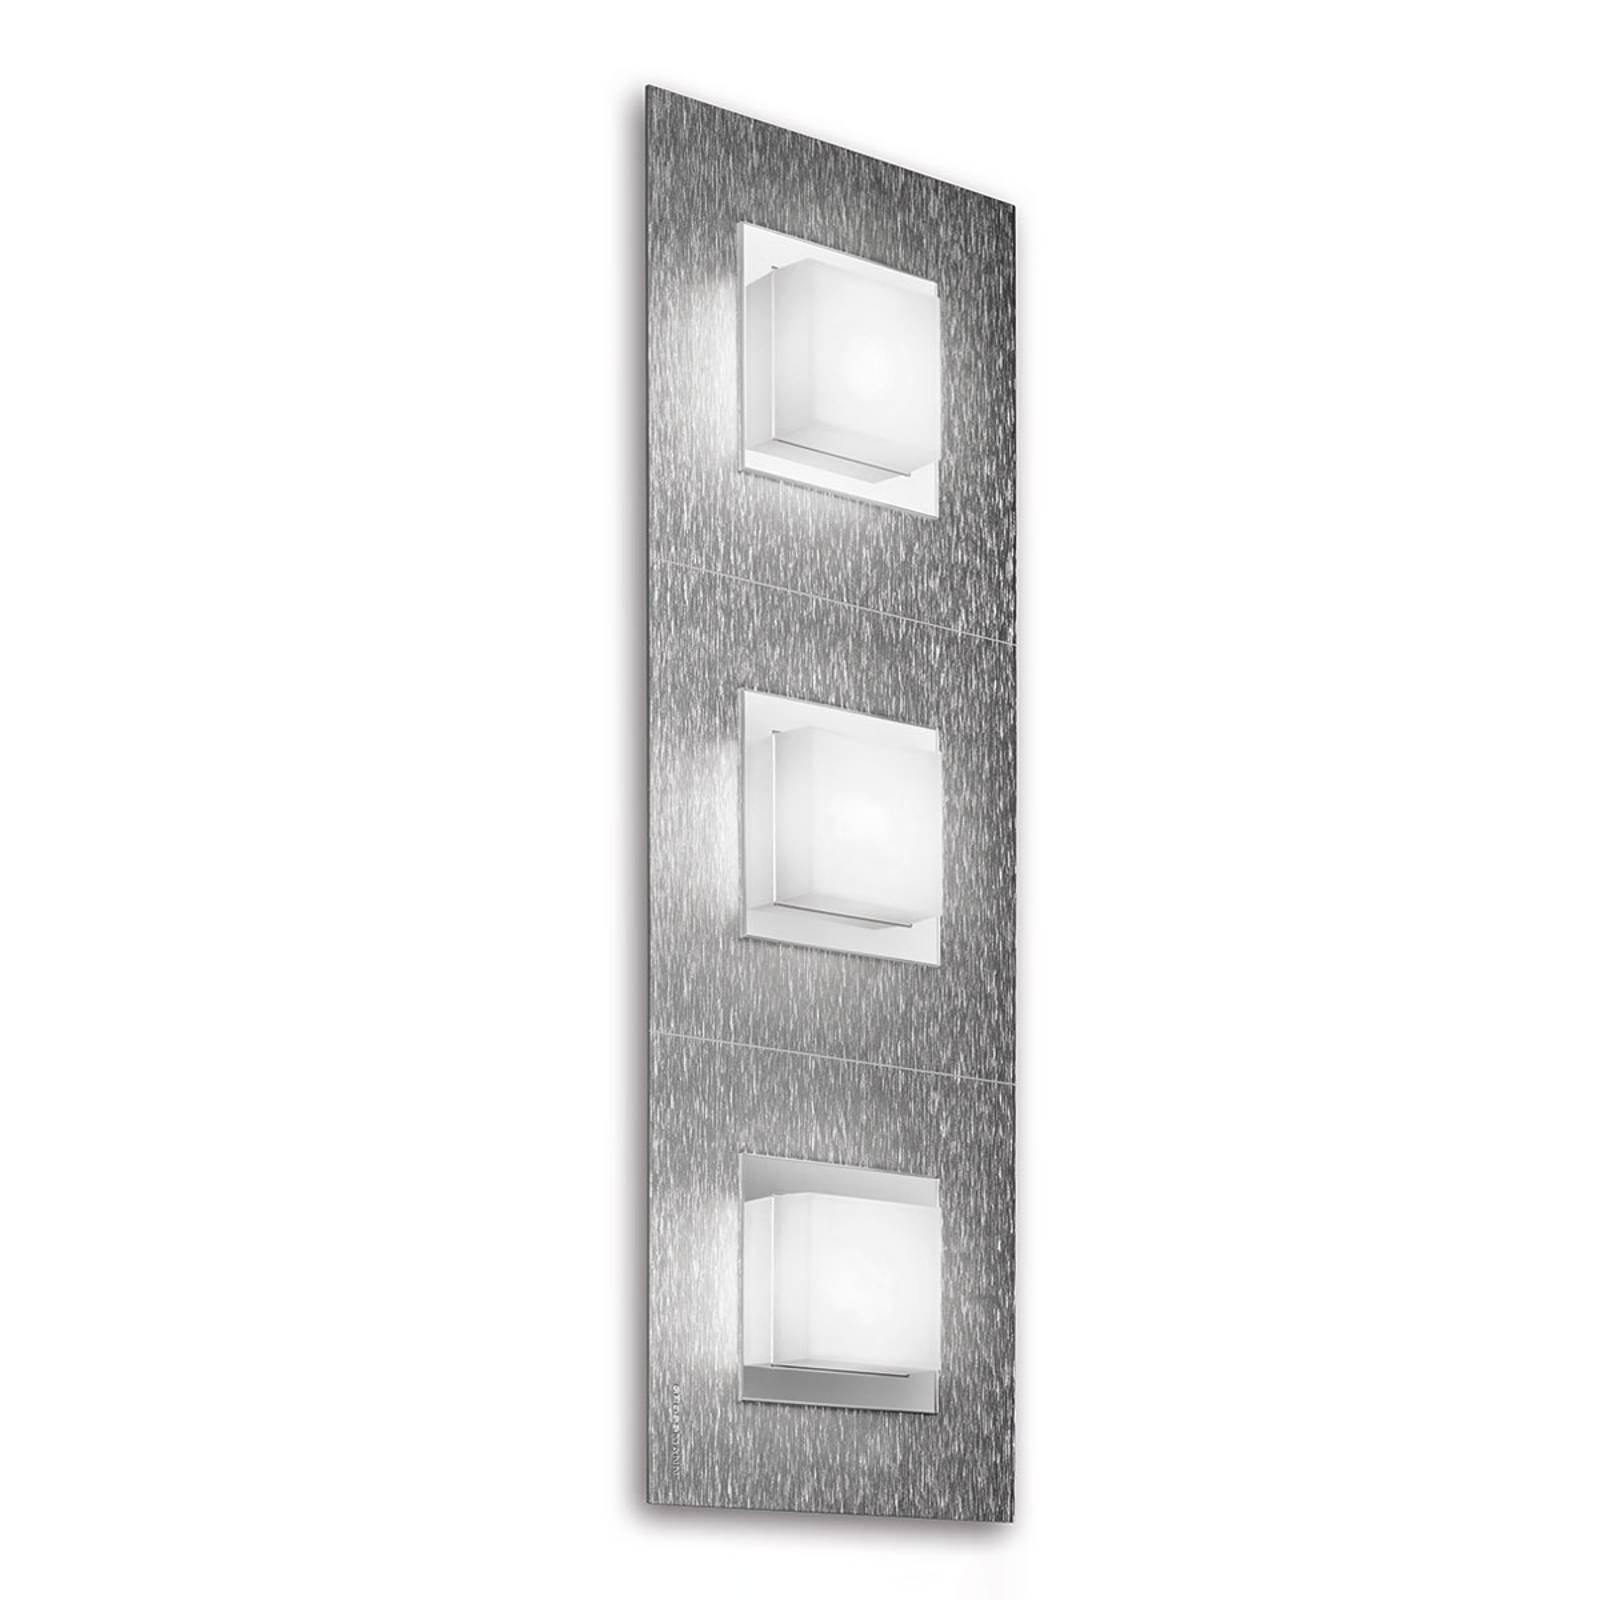 GROSSMANN Basic LED-vegglampe 3lk., aluminium